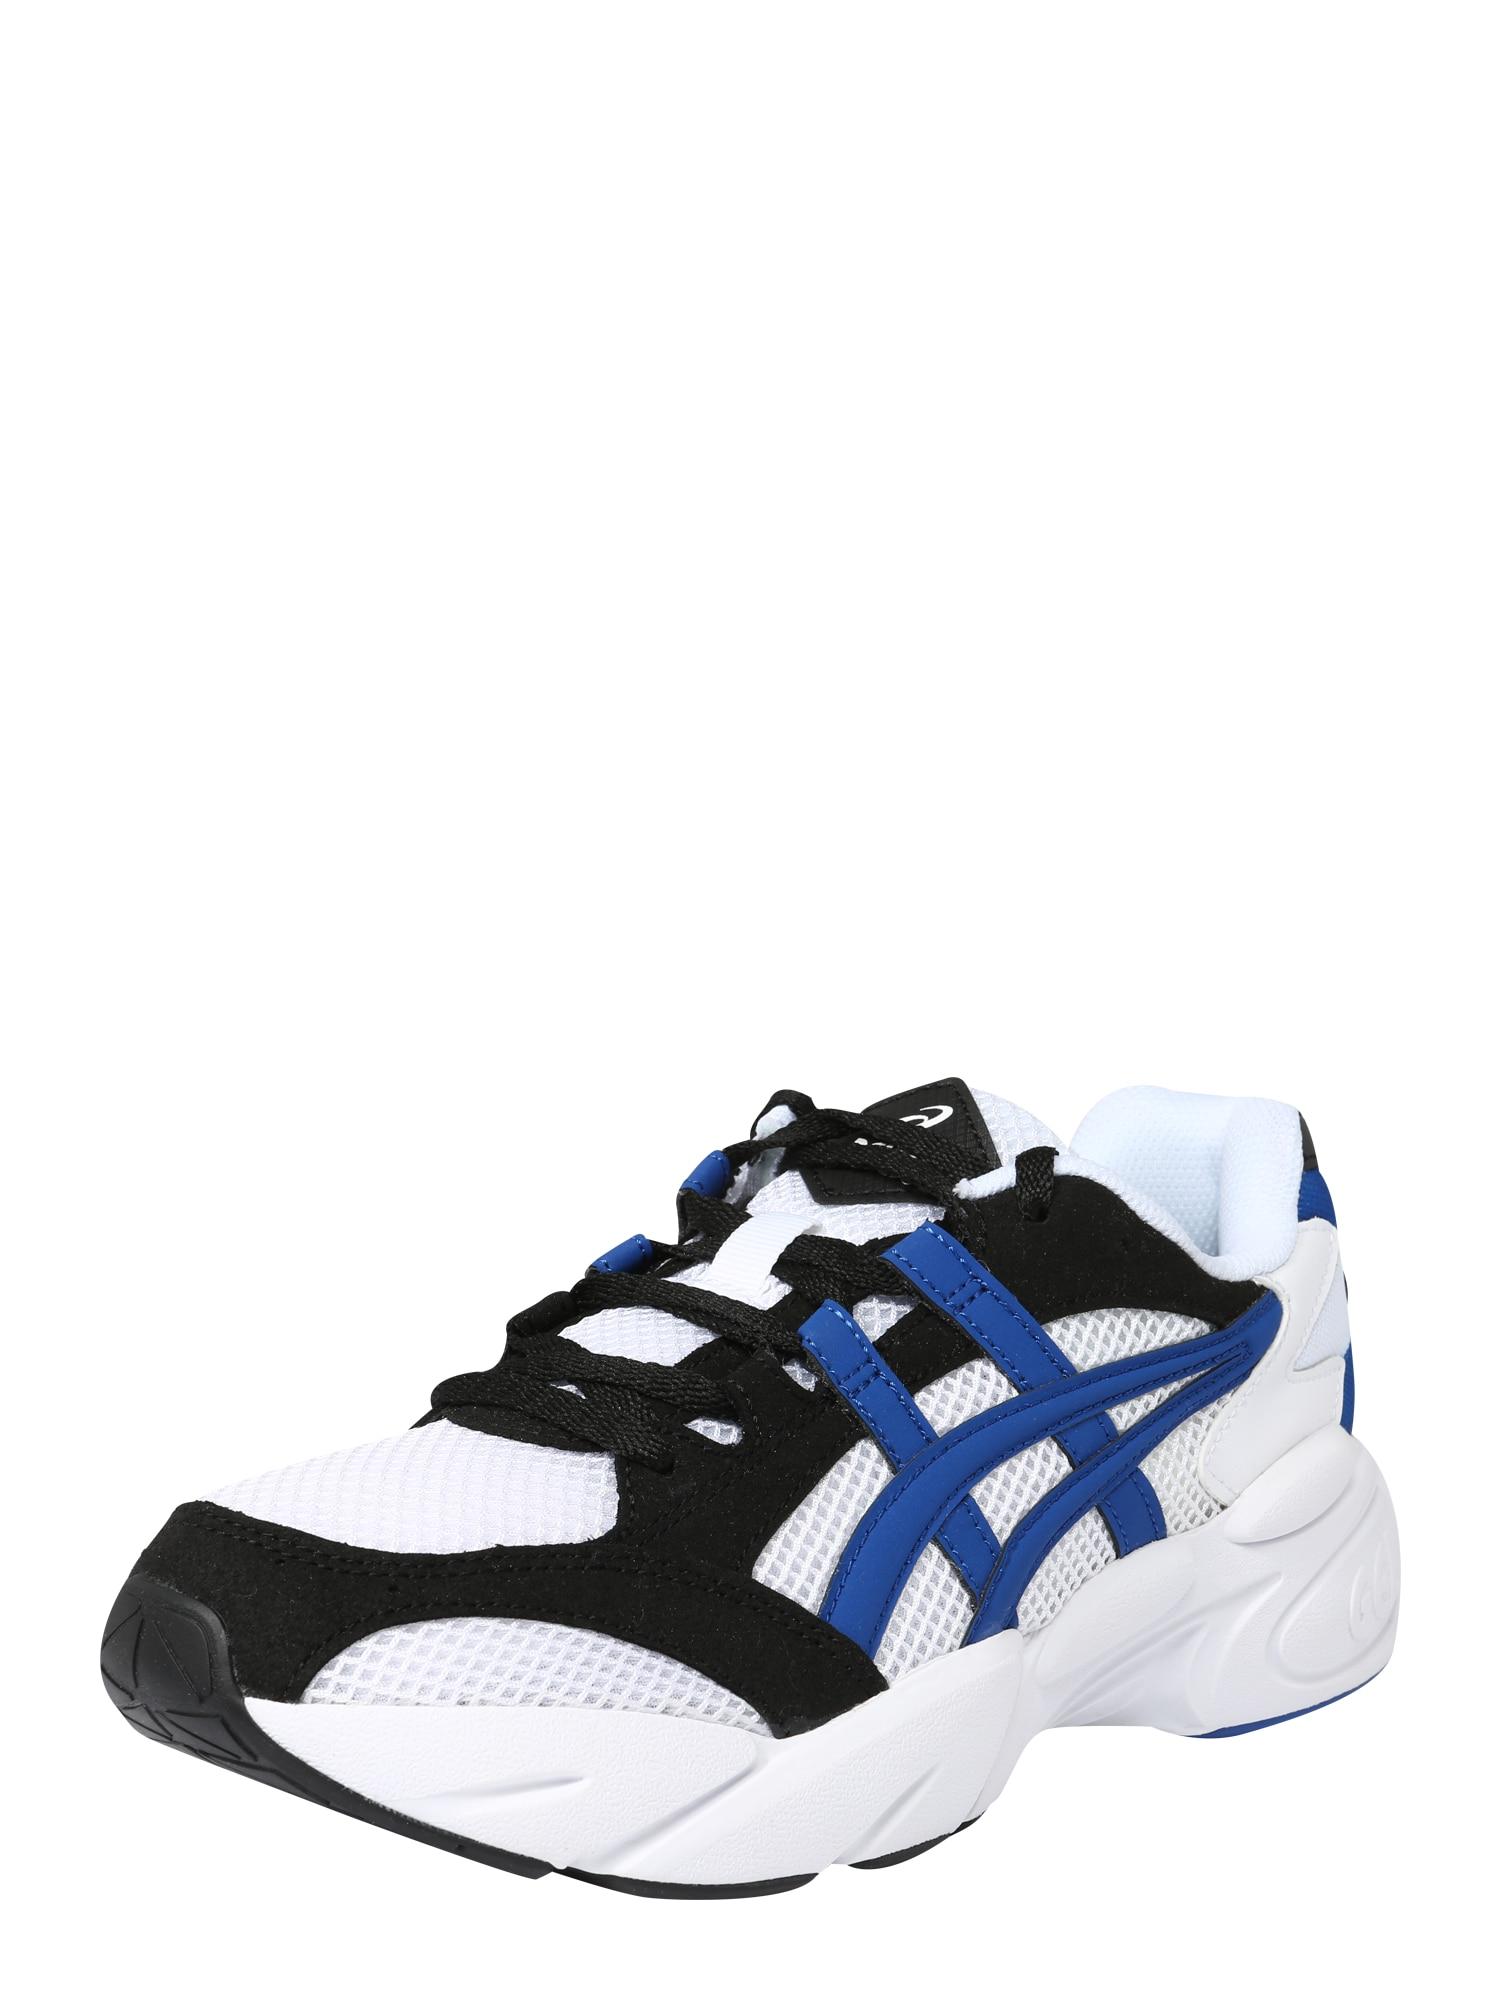 Tenisky GEL-BONDI tmavě modrá černá bílá Asics Tiger